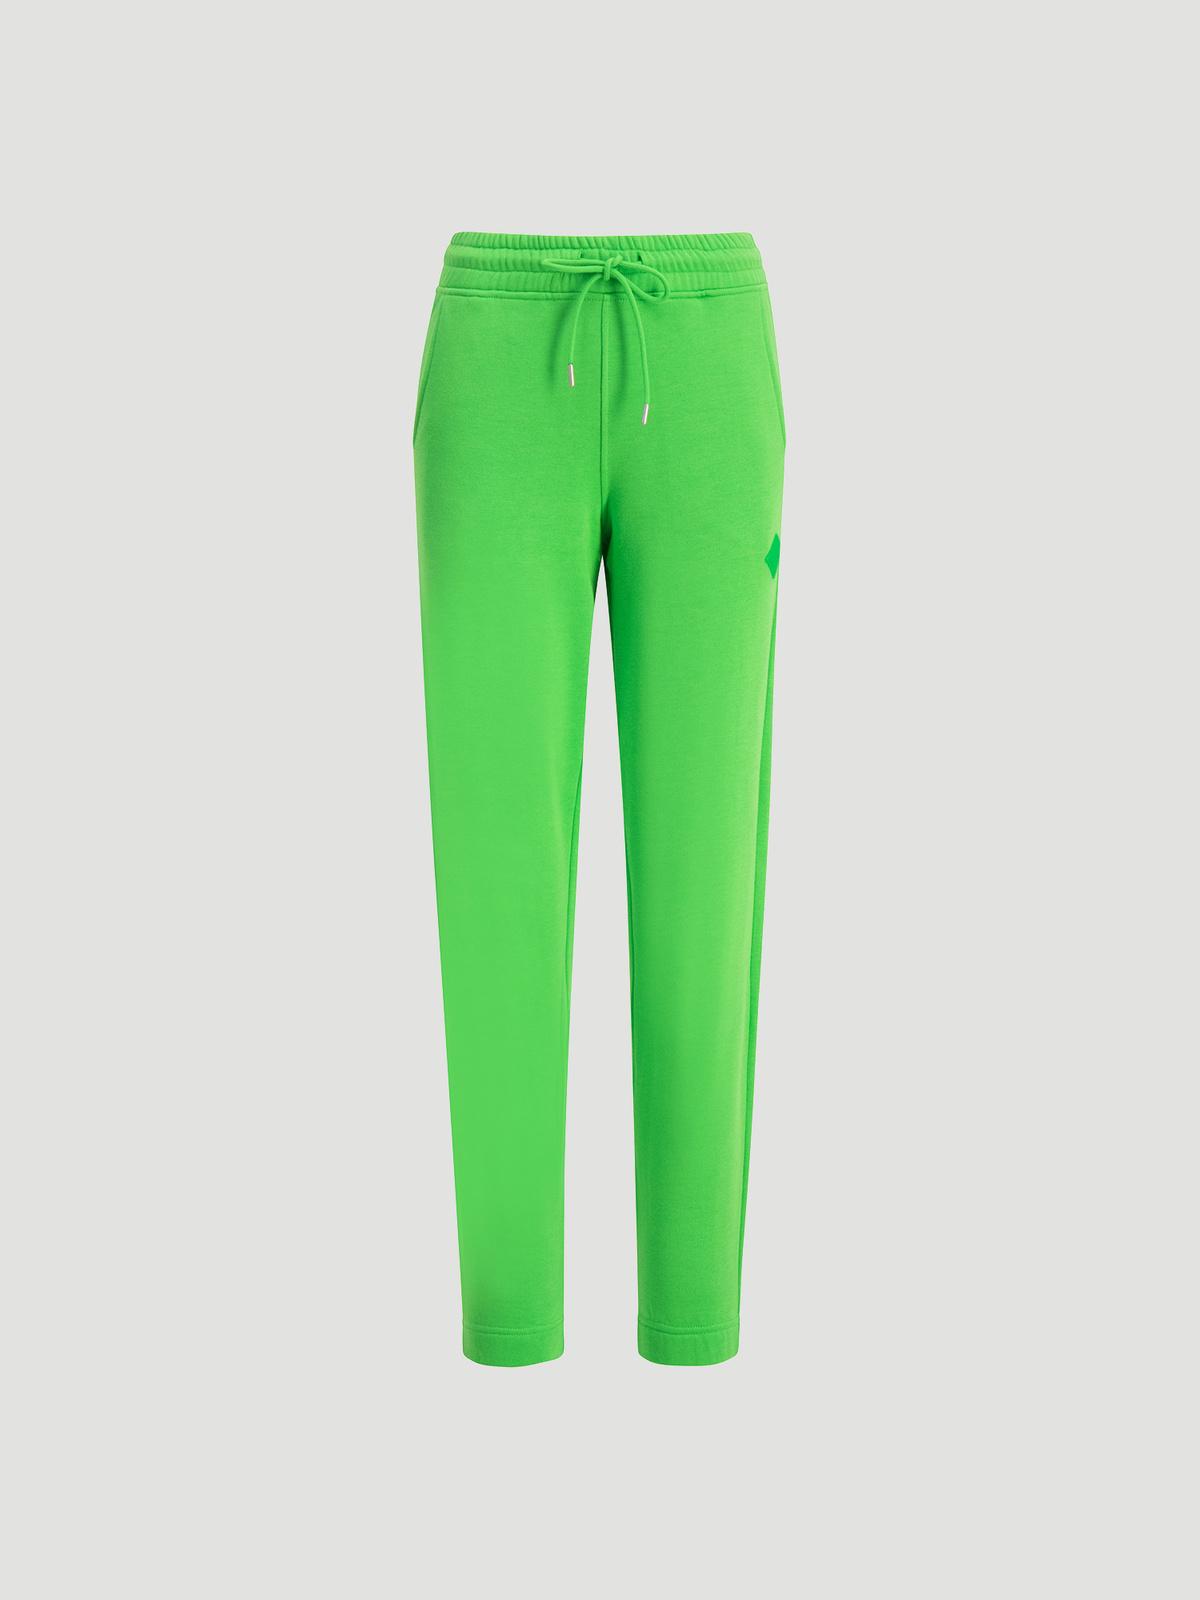 Hanger Trousers Green 0